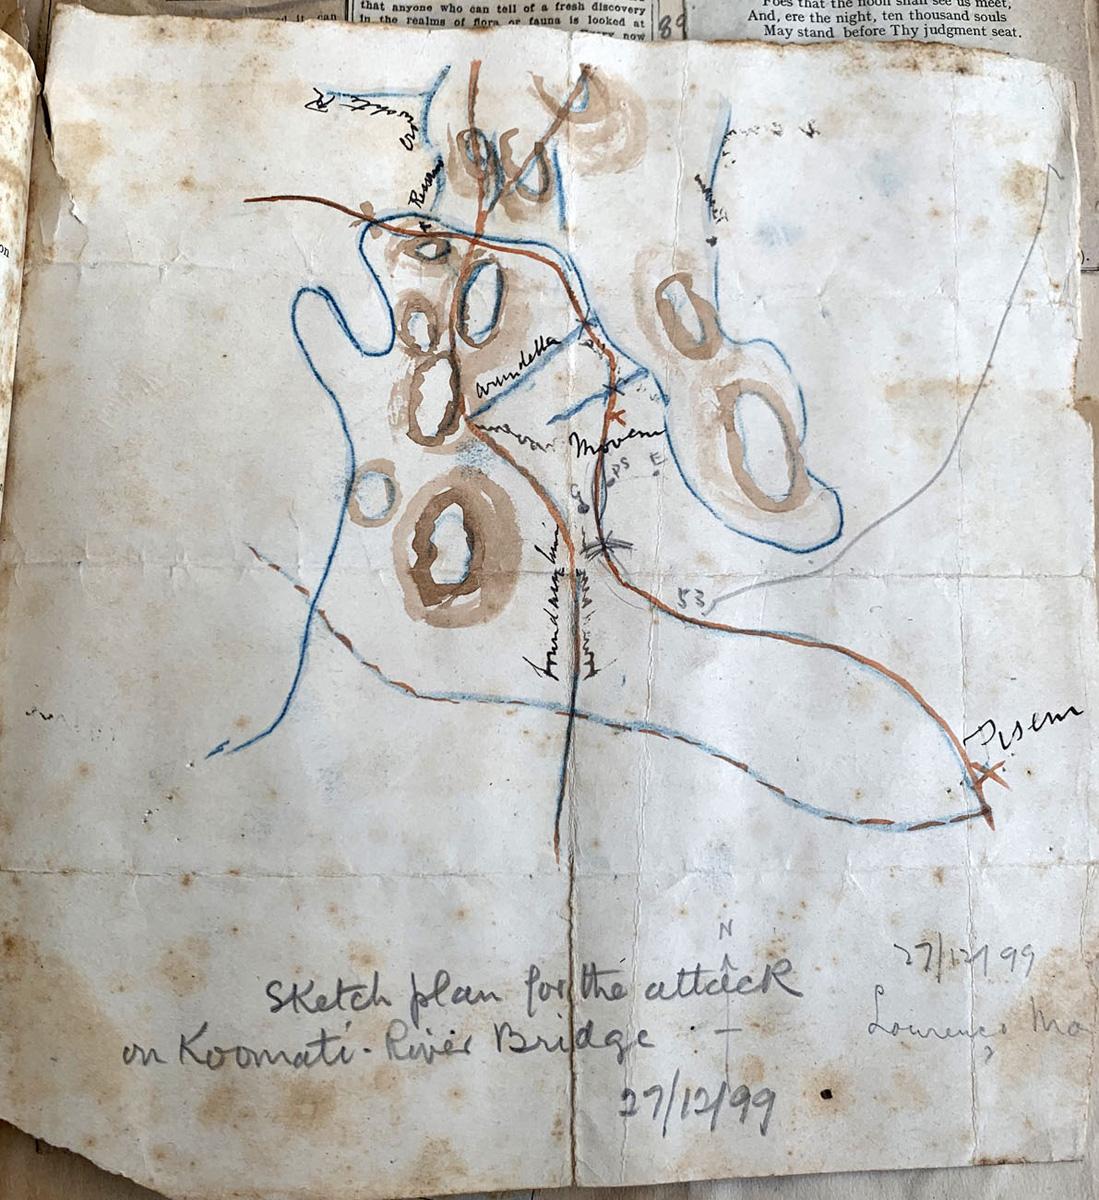 1899_sketch_plan_attack_on_Komari_River_Bridge_sml.jpg